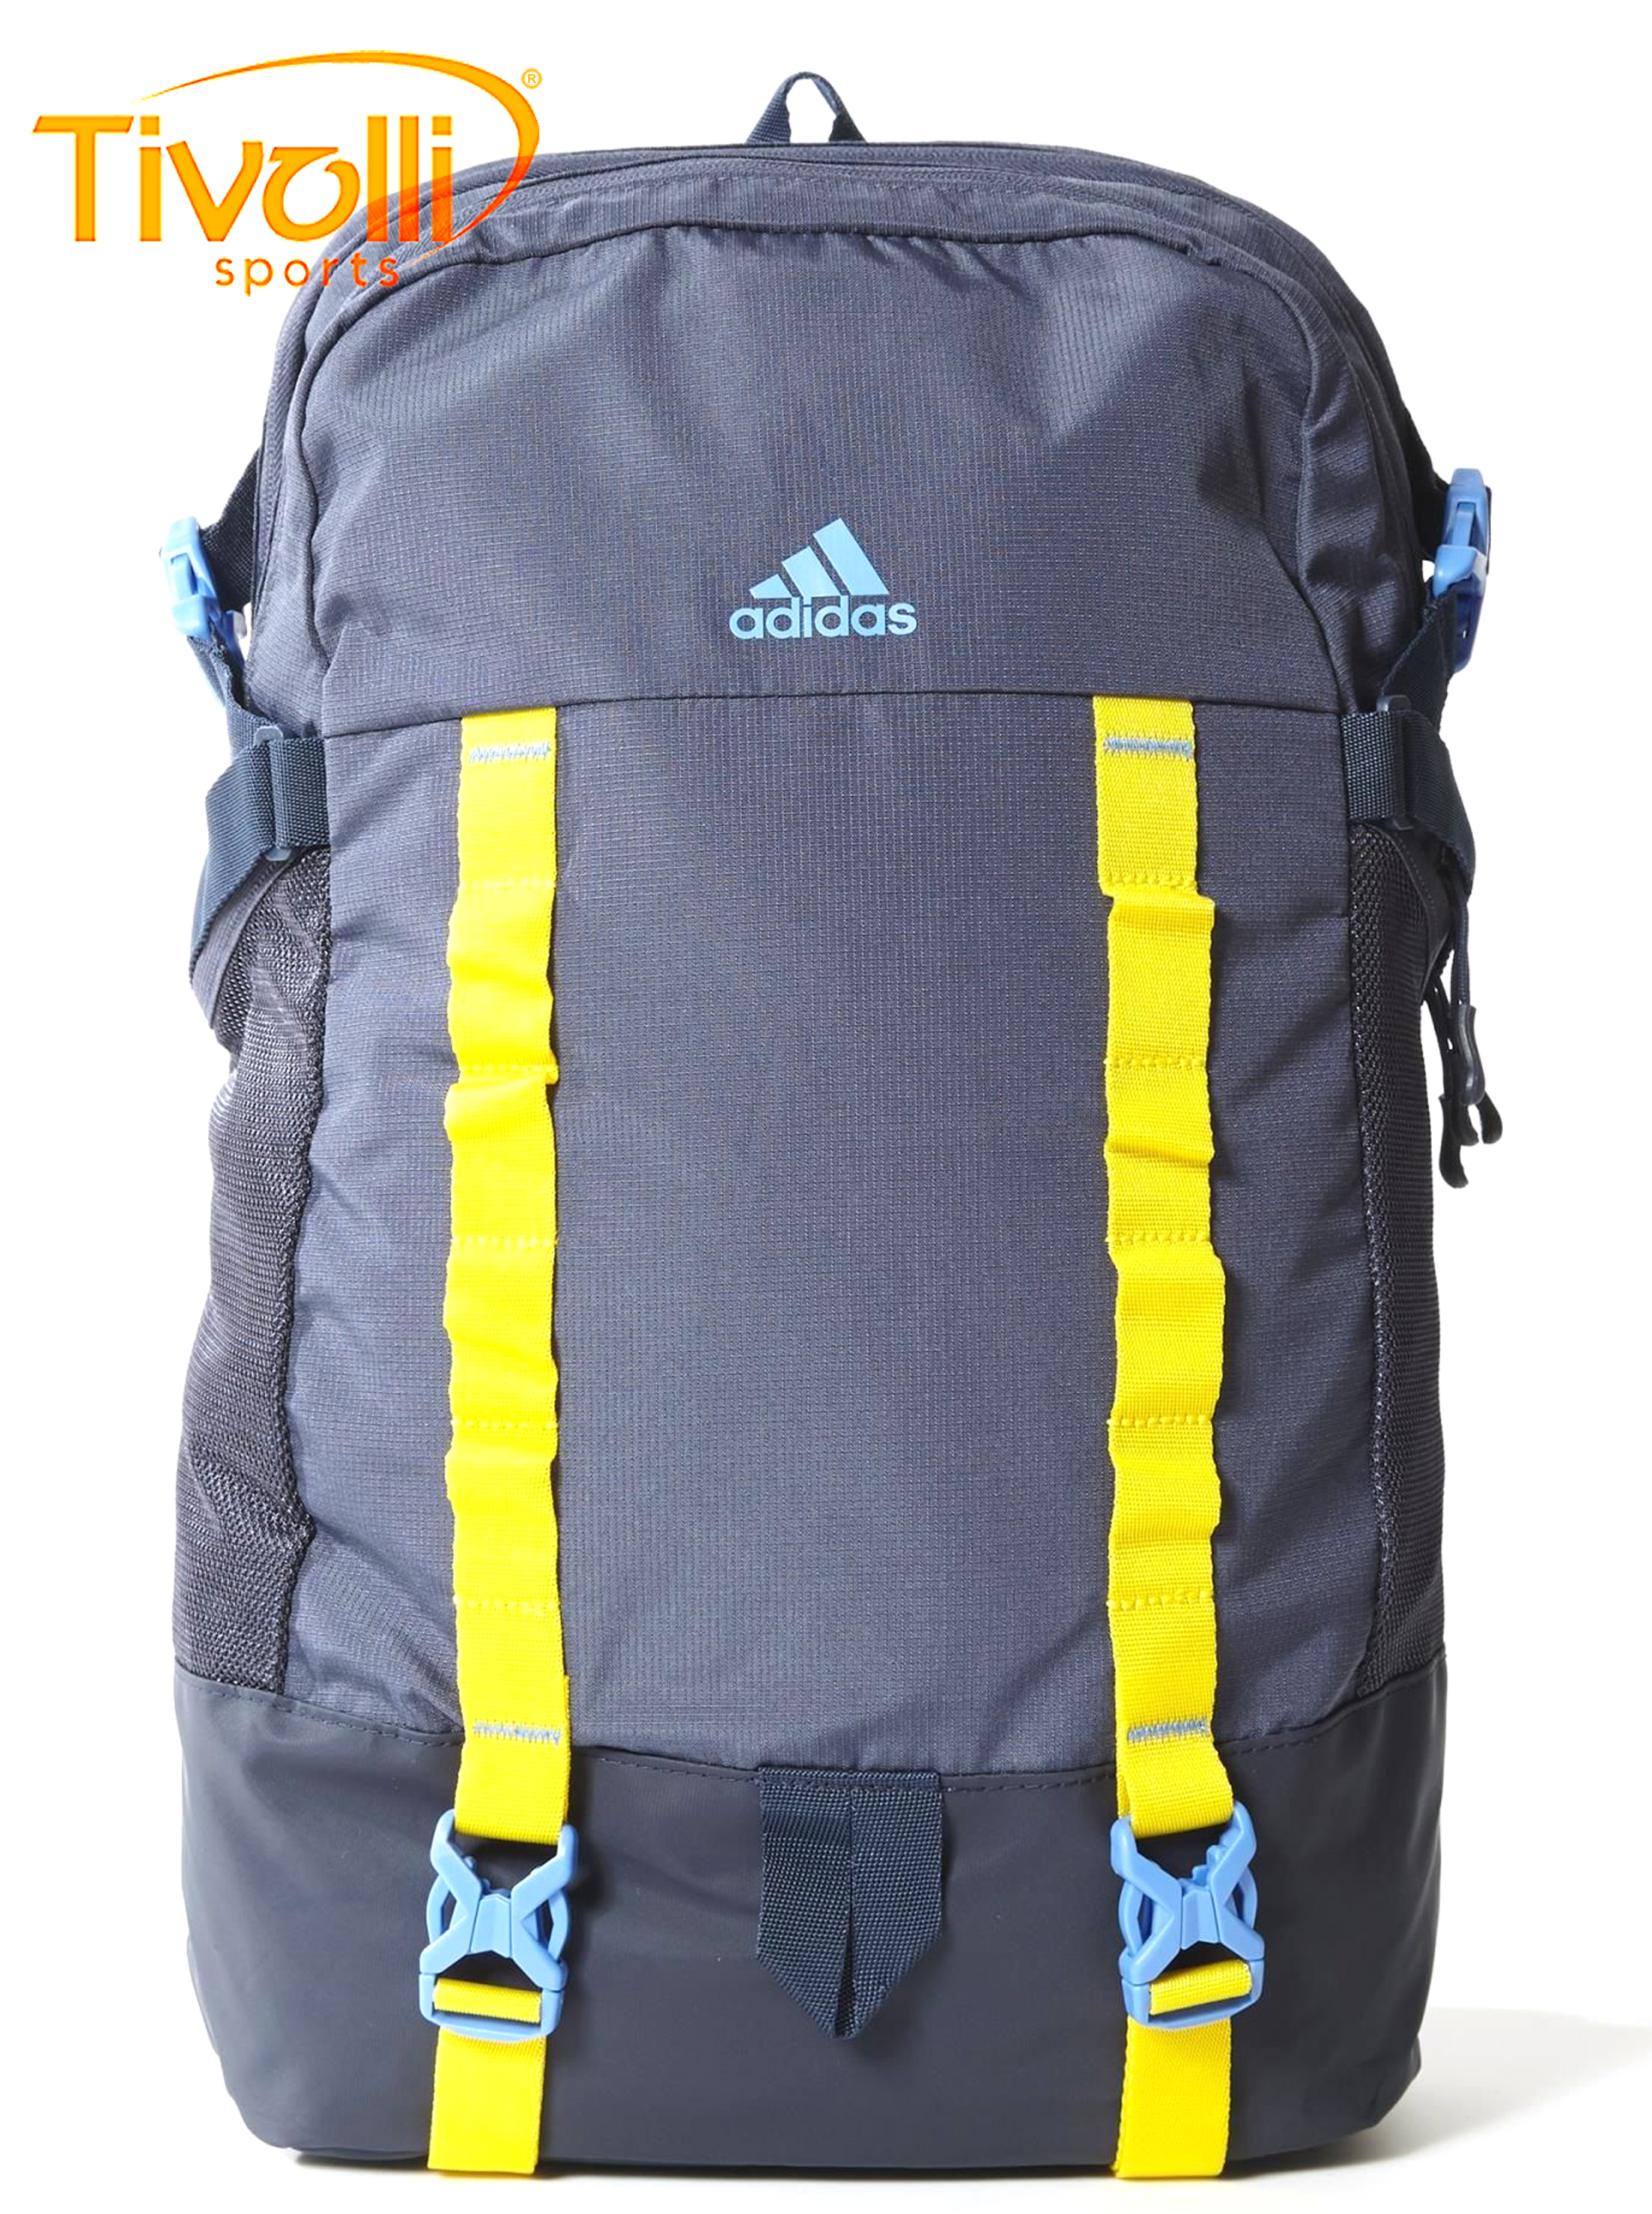 2911fe787 Mochila Adidas All Outdoor Backpack > azul e amarela >